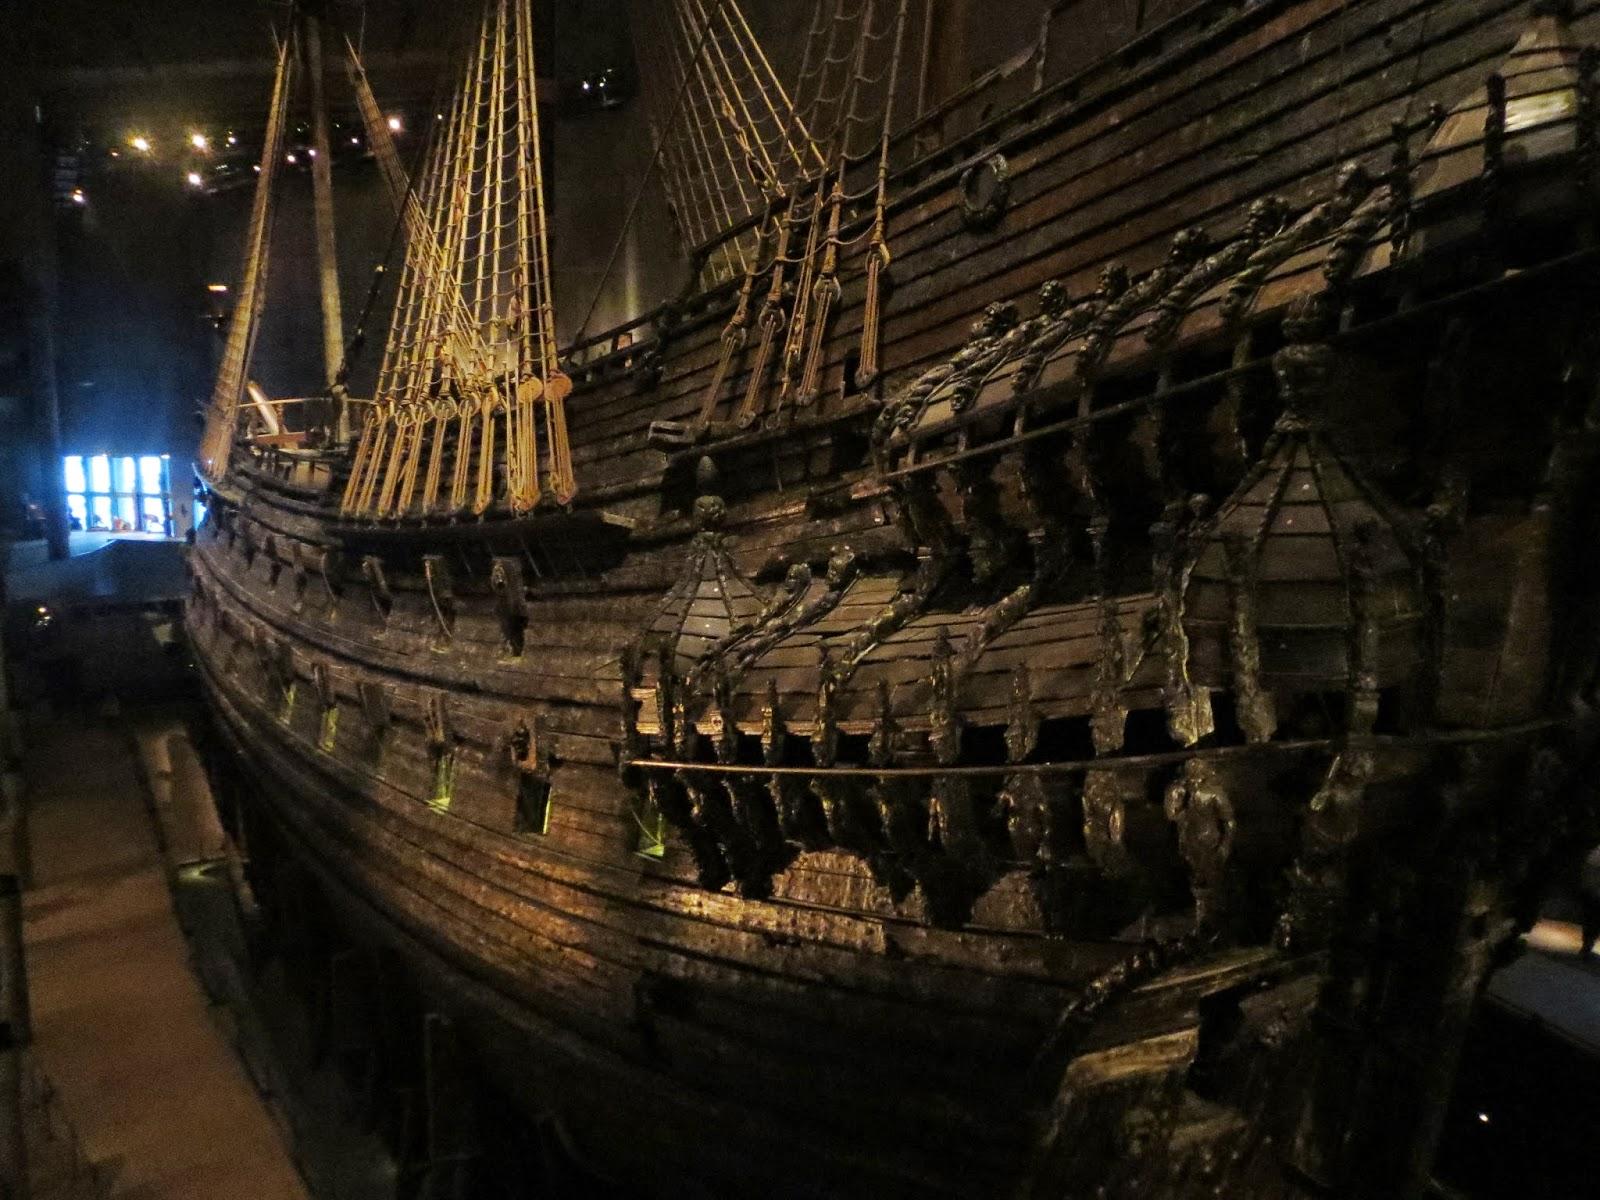 Londinoupolis the vasa museum stockholm for Vasa ship